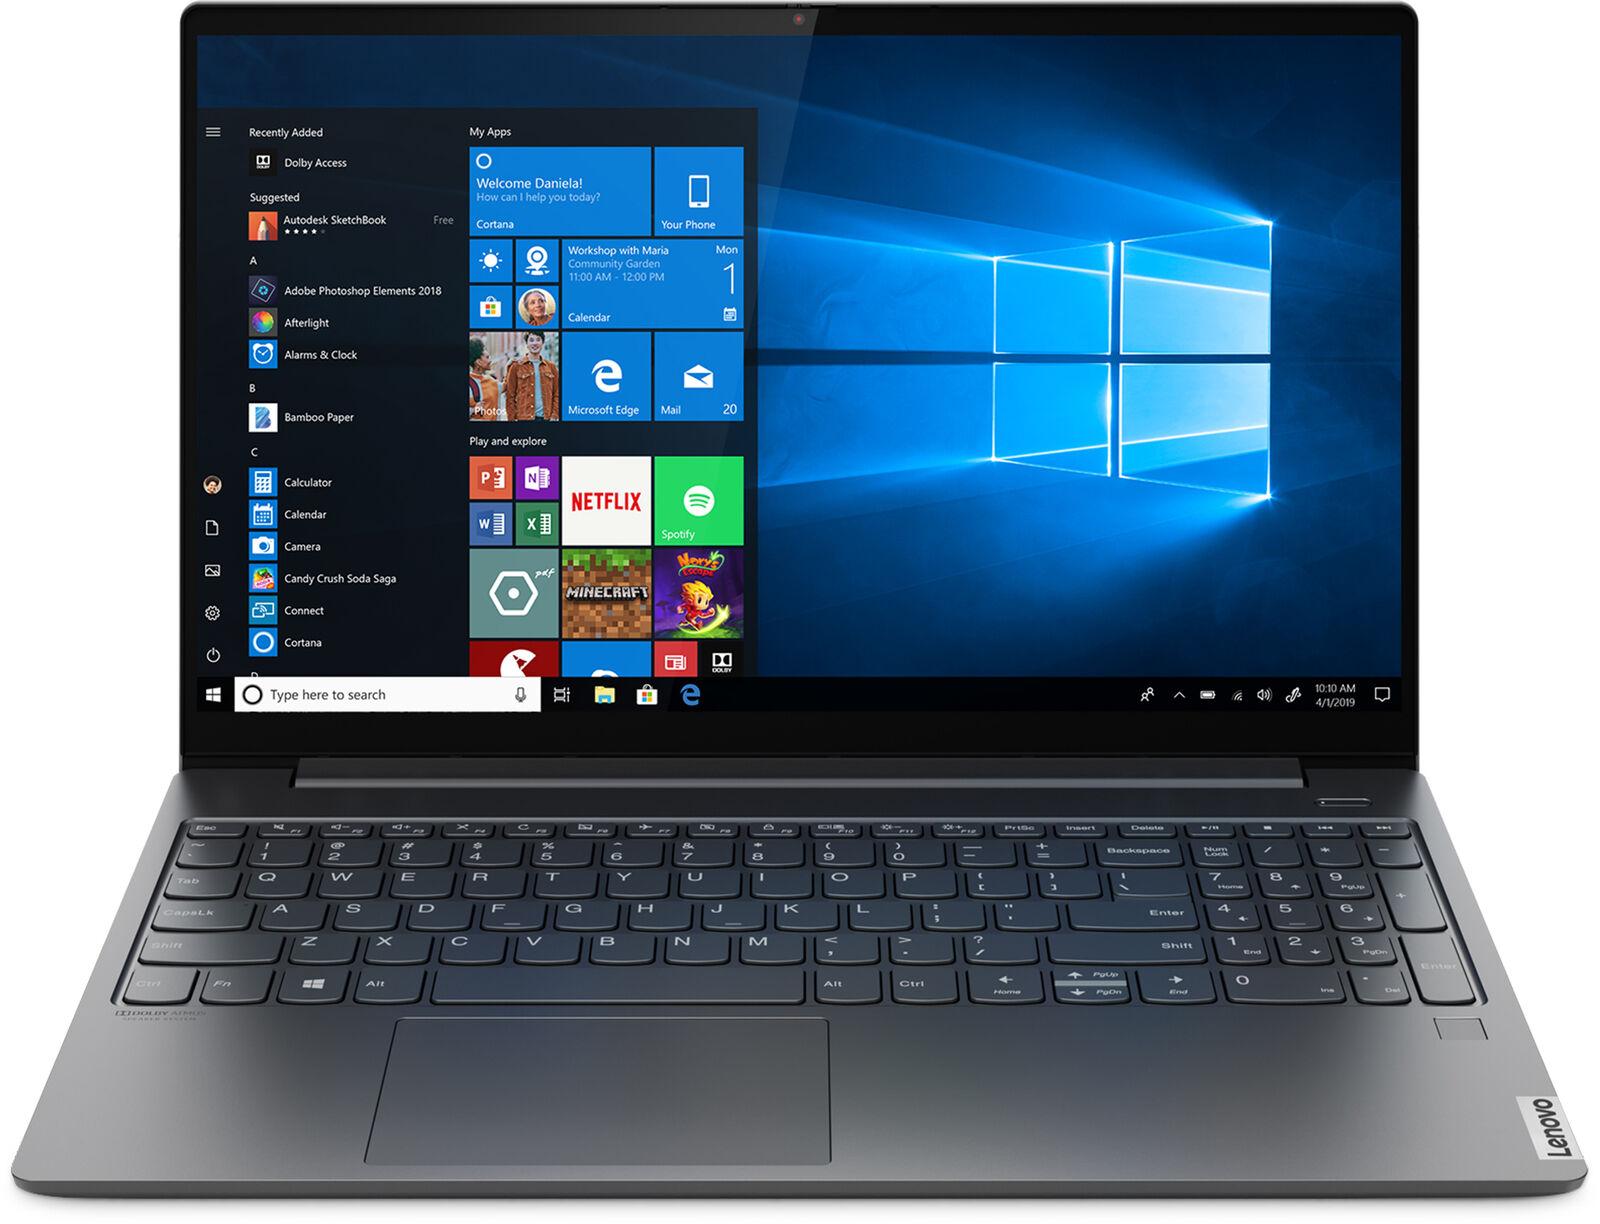 Lenovo IdeaPad S740 (81NW0000US) 15.6″ 4K Touch Laptop, 9th Gen Core i7, 16GB RAM, 1TB SSD